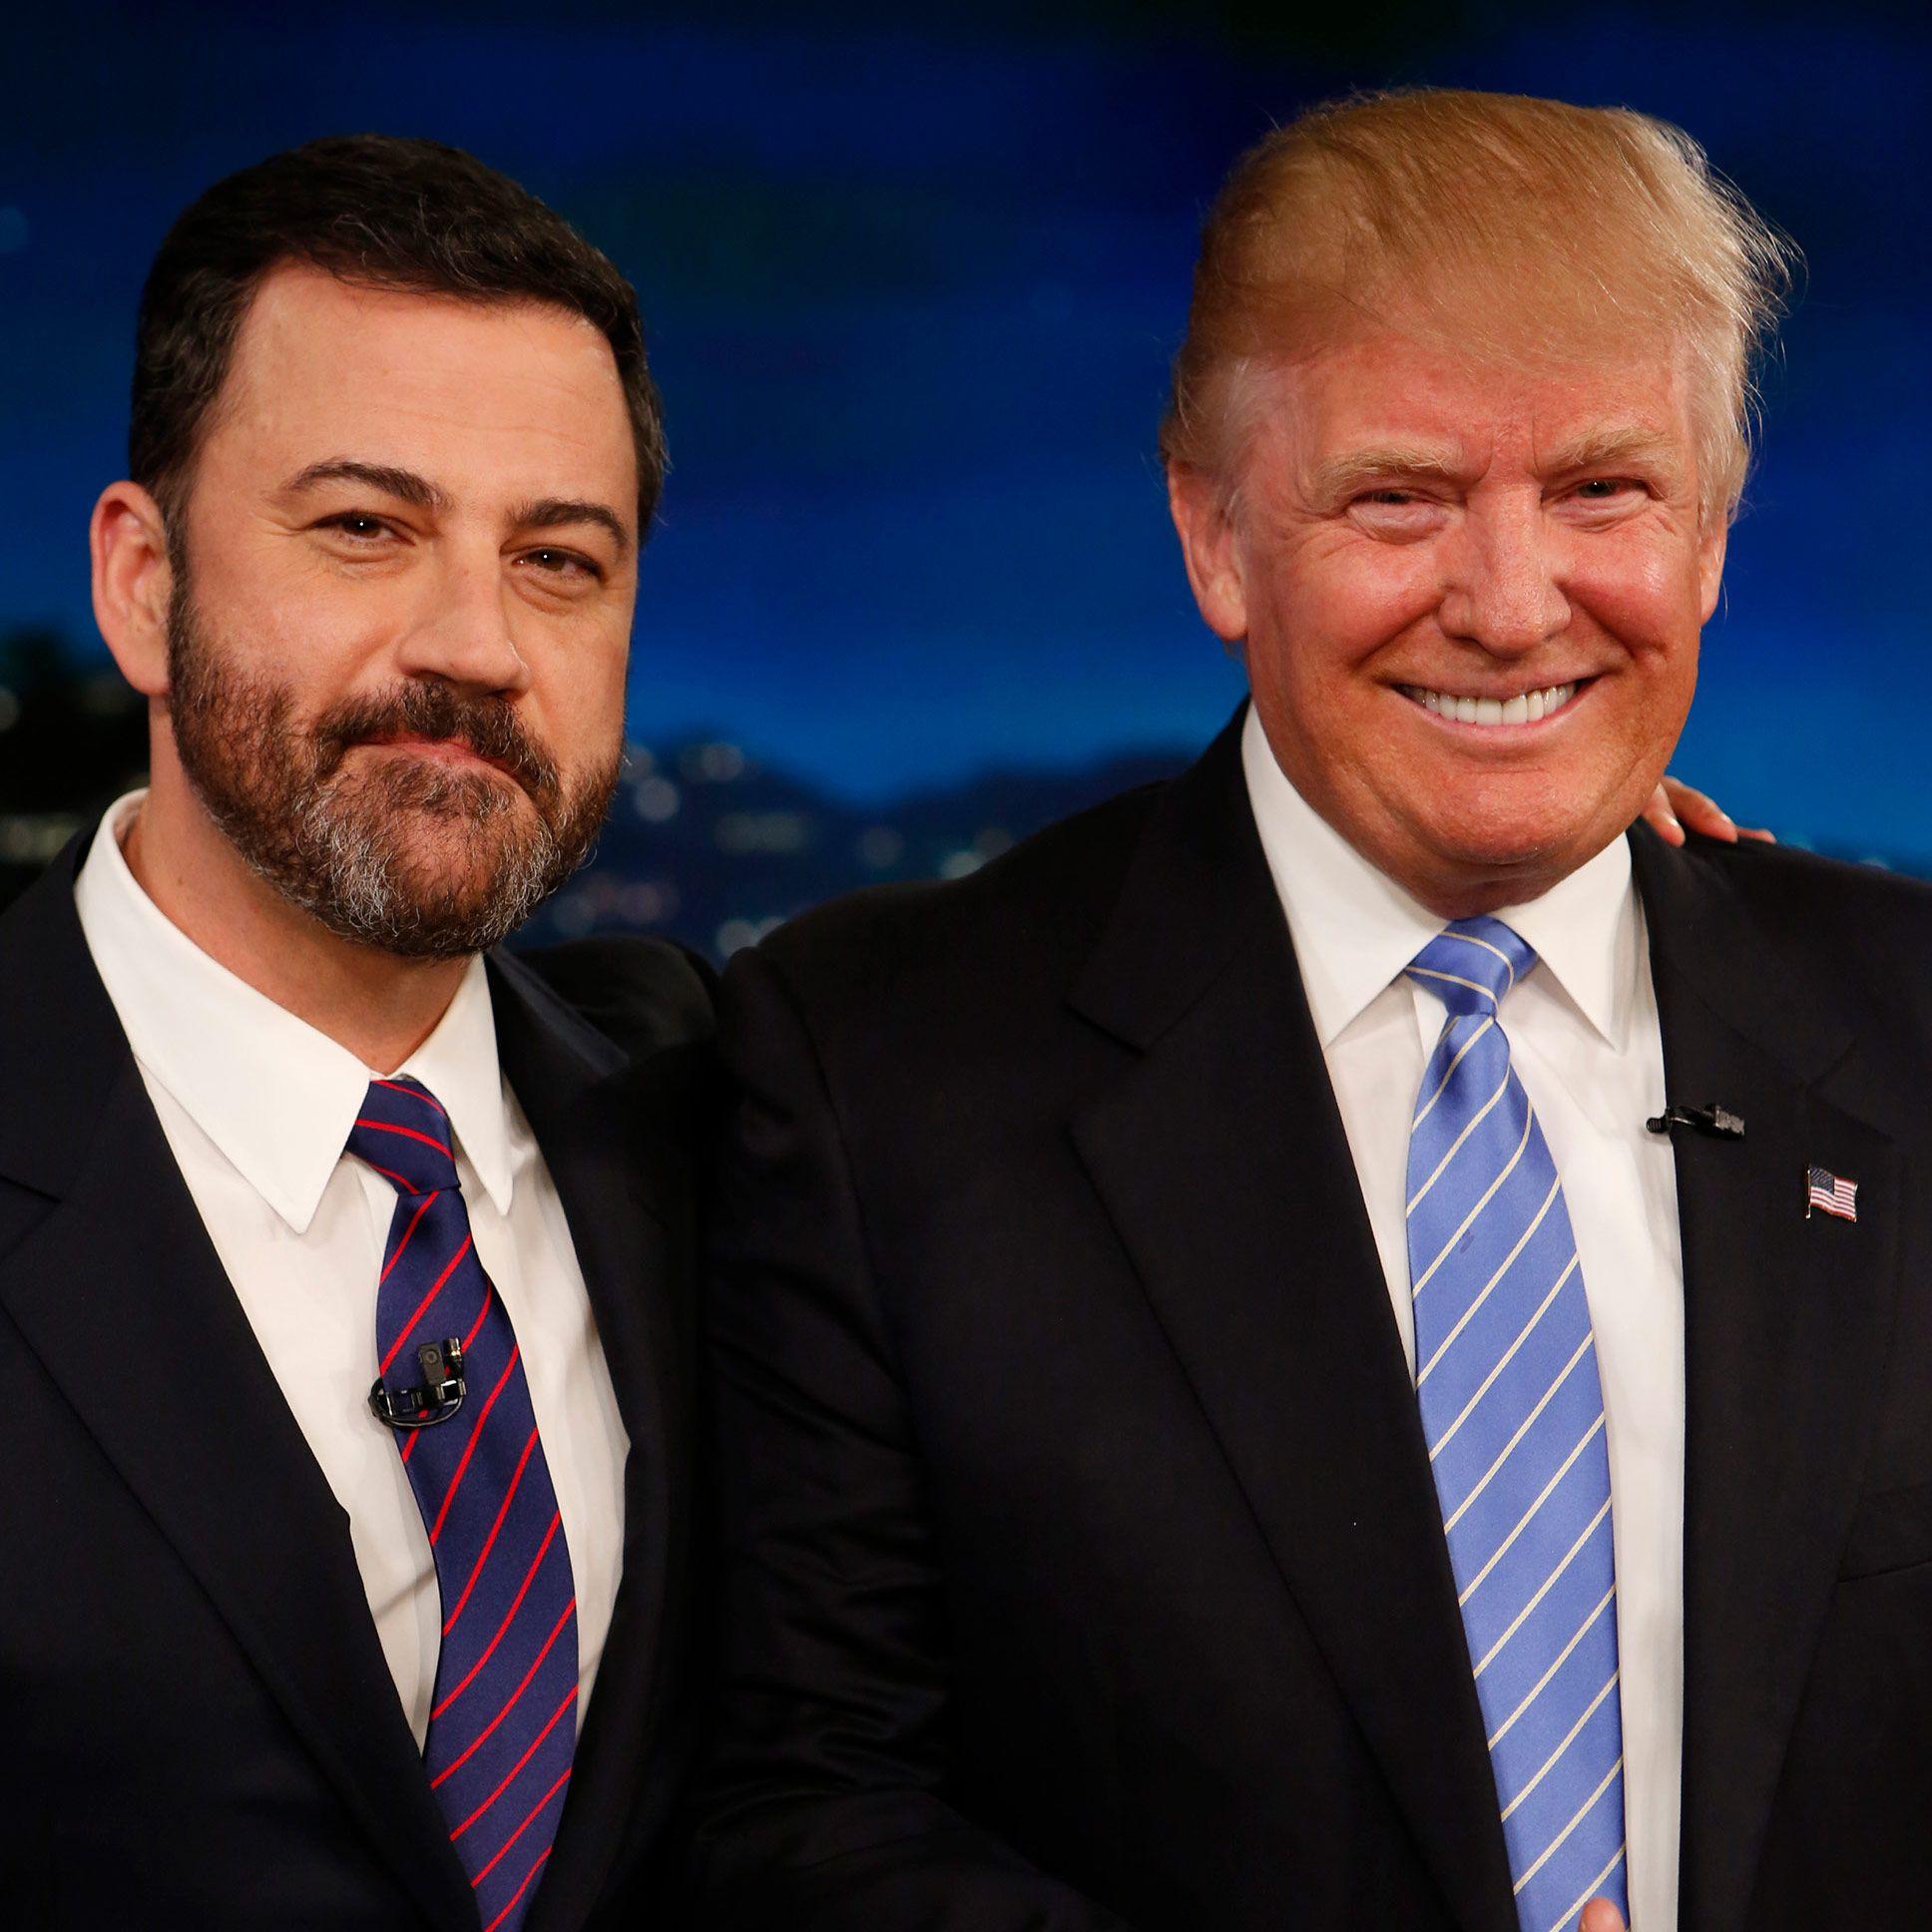 ¿Cuánto mide Jimmy Kimmel? - Altura - Real height Bd716c4b981c9138a061c6861e63d8febe-16-jimmy-kimmel-donald-trump.2x.rsquare.w1200